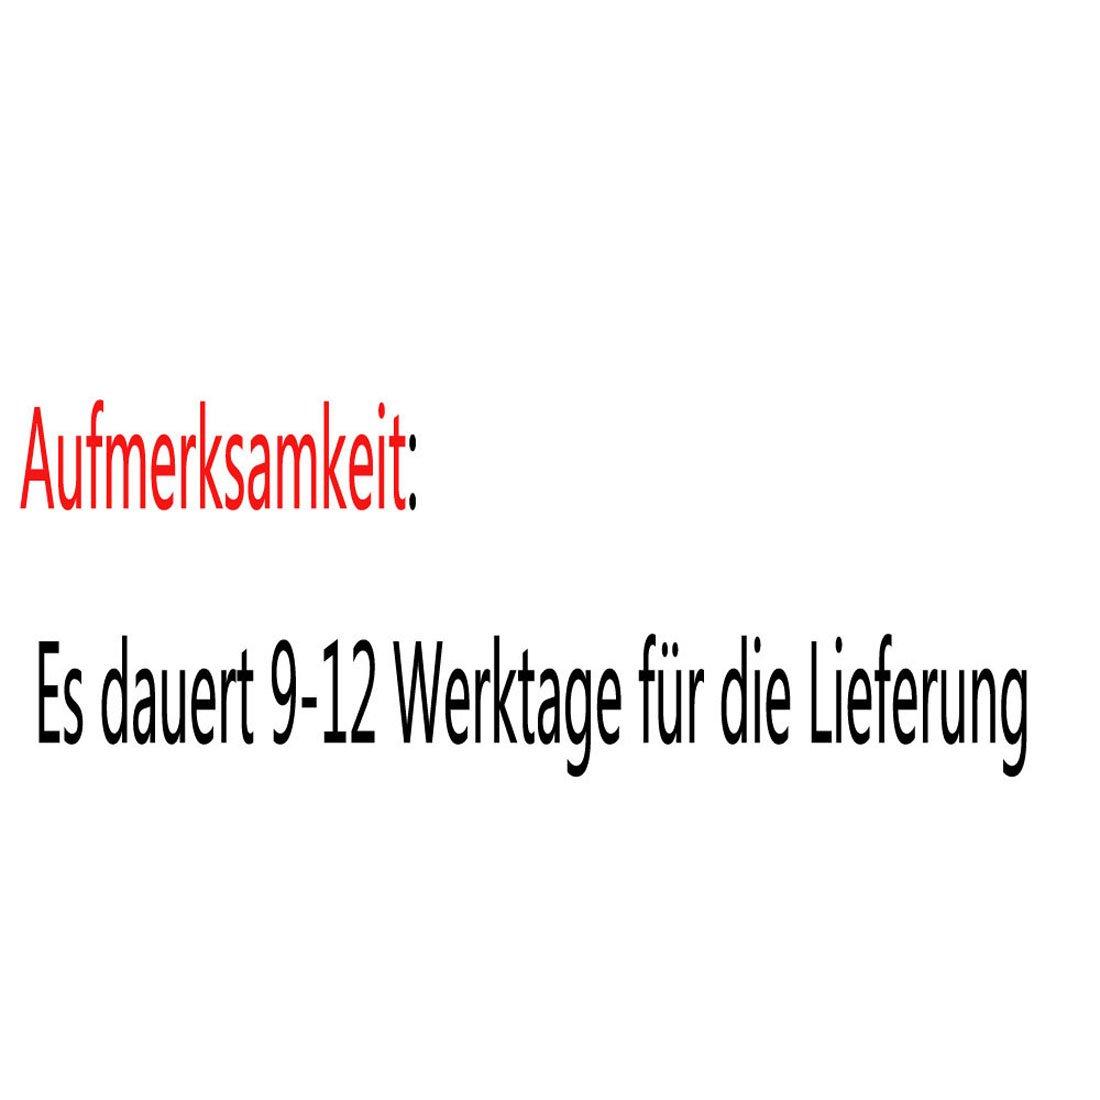 Andux Zone 2 St/ück Leder Autositzauflage Spacer Gap Filler Fit Padding Alle Autos QC-FLS01 Schwarz